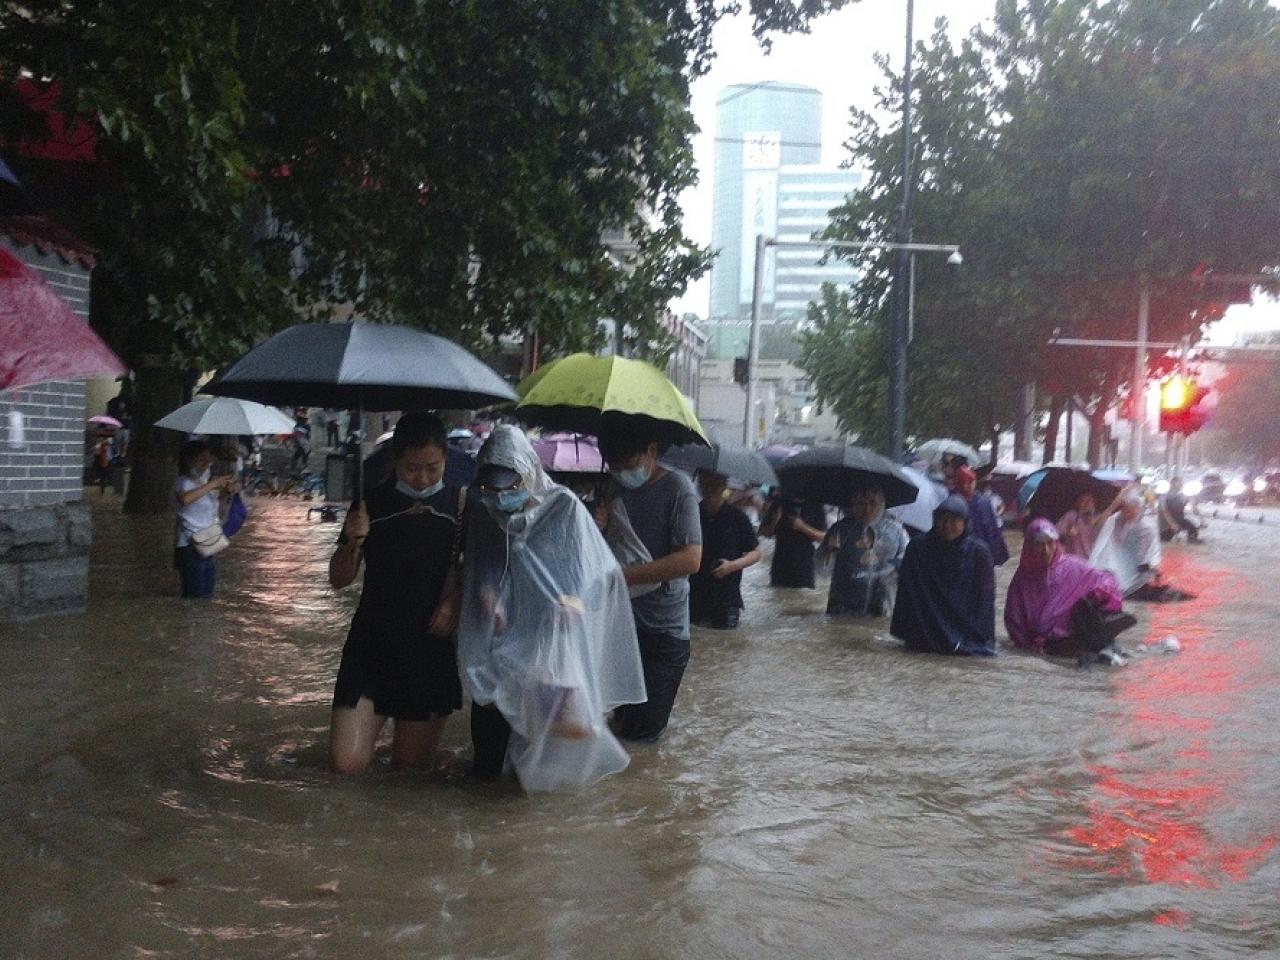 Severe rainstorms kill 16 in central China